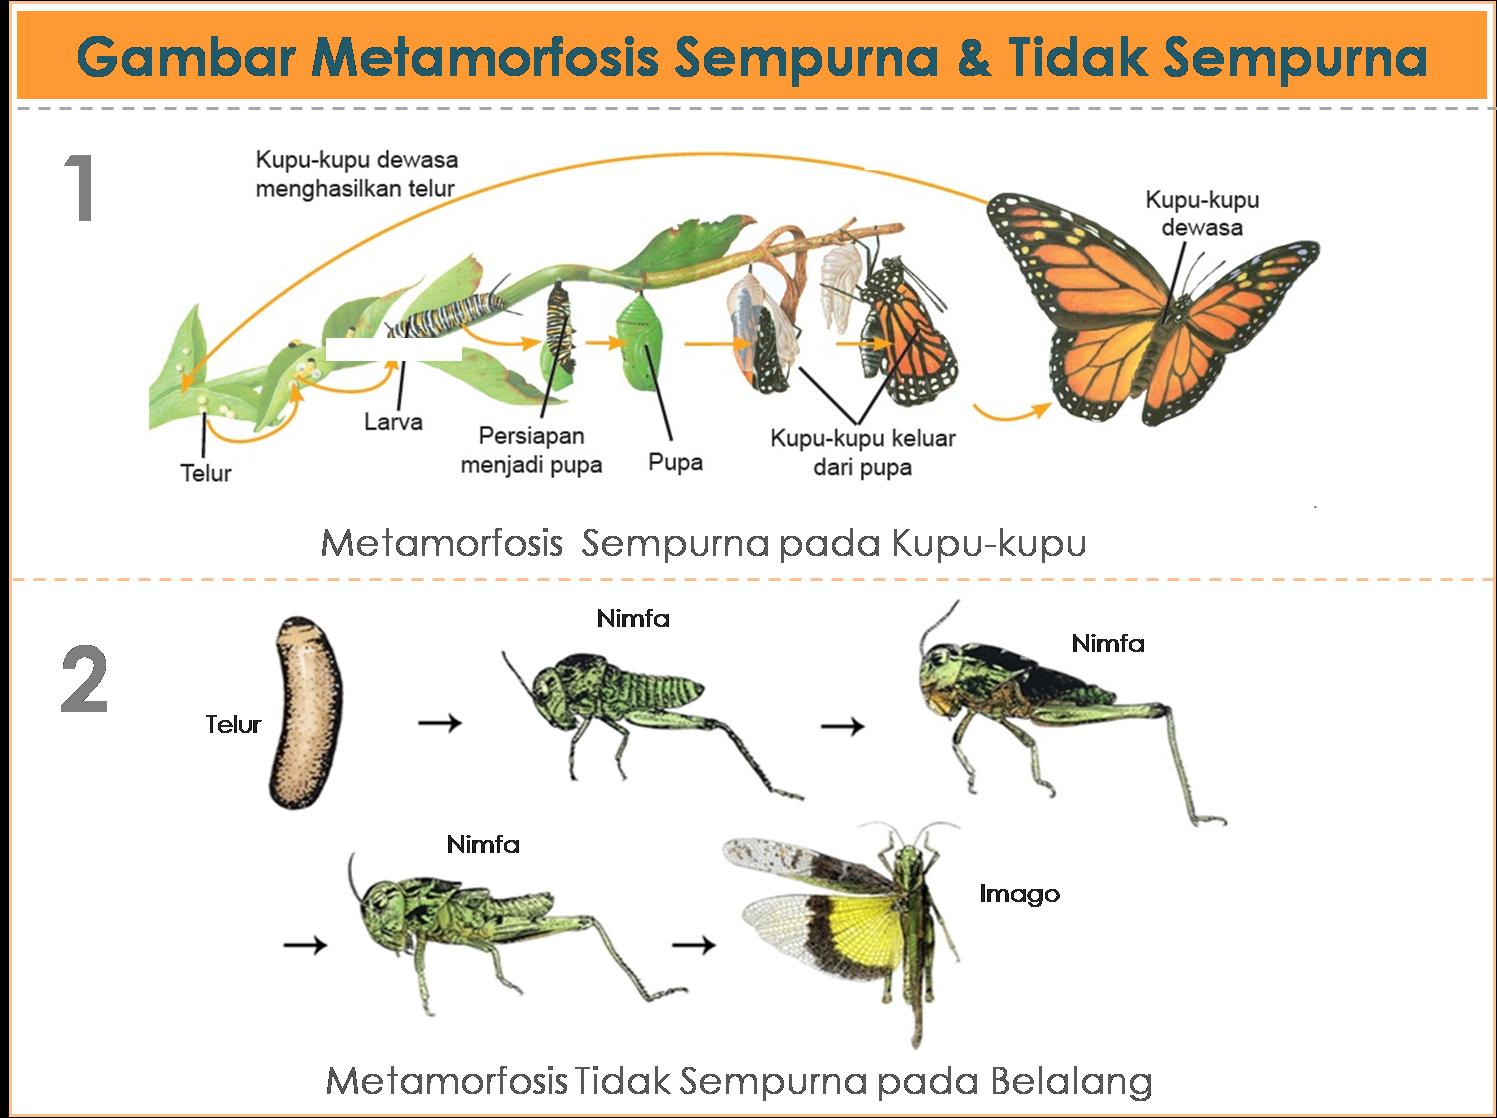 Gambar metamorfosis daur hidup pada serangga dan amfibi freewaremini gambar metamorfosis daur hidup pada serangga dan amfibi ccuart Gallery